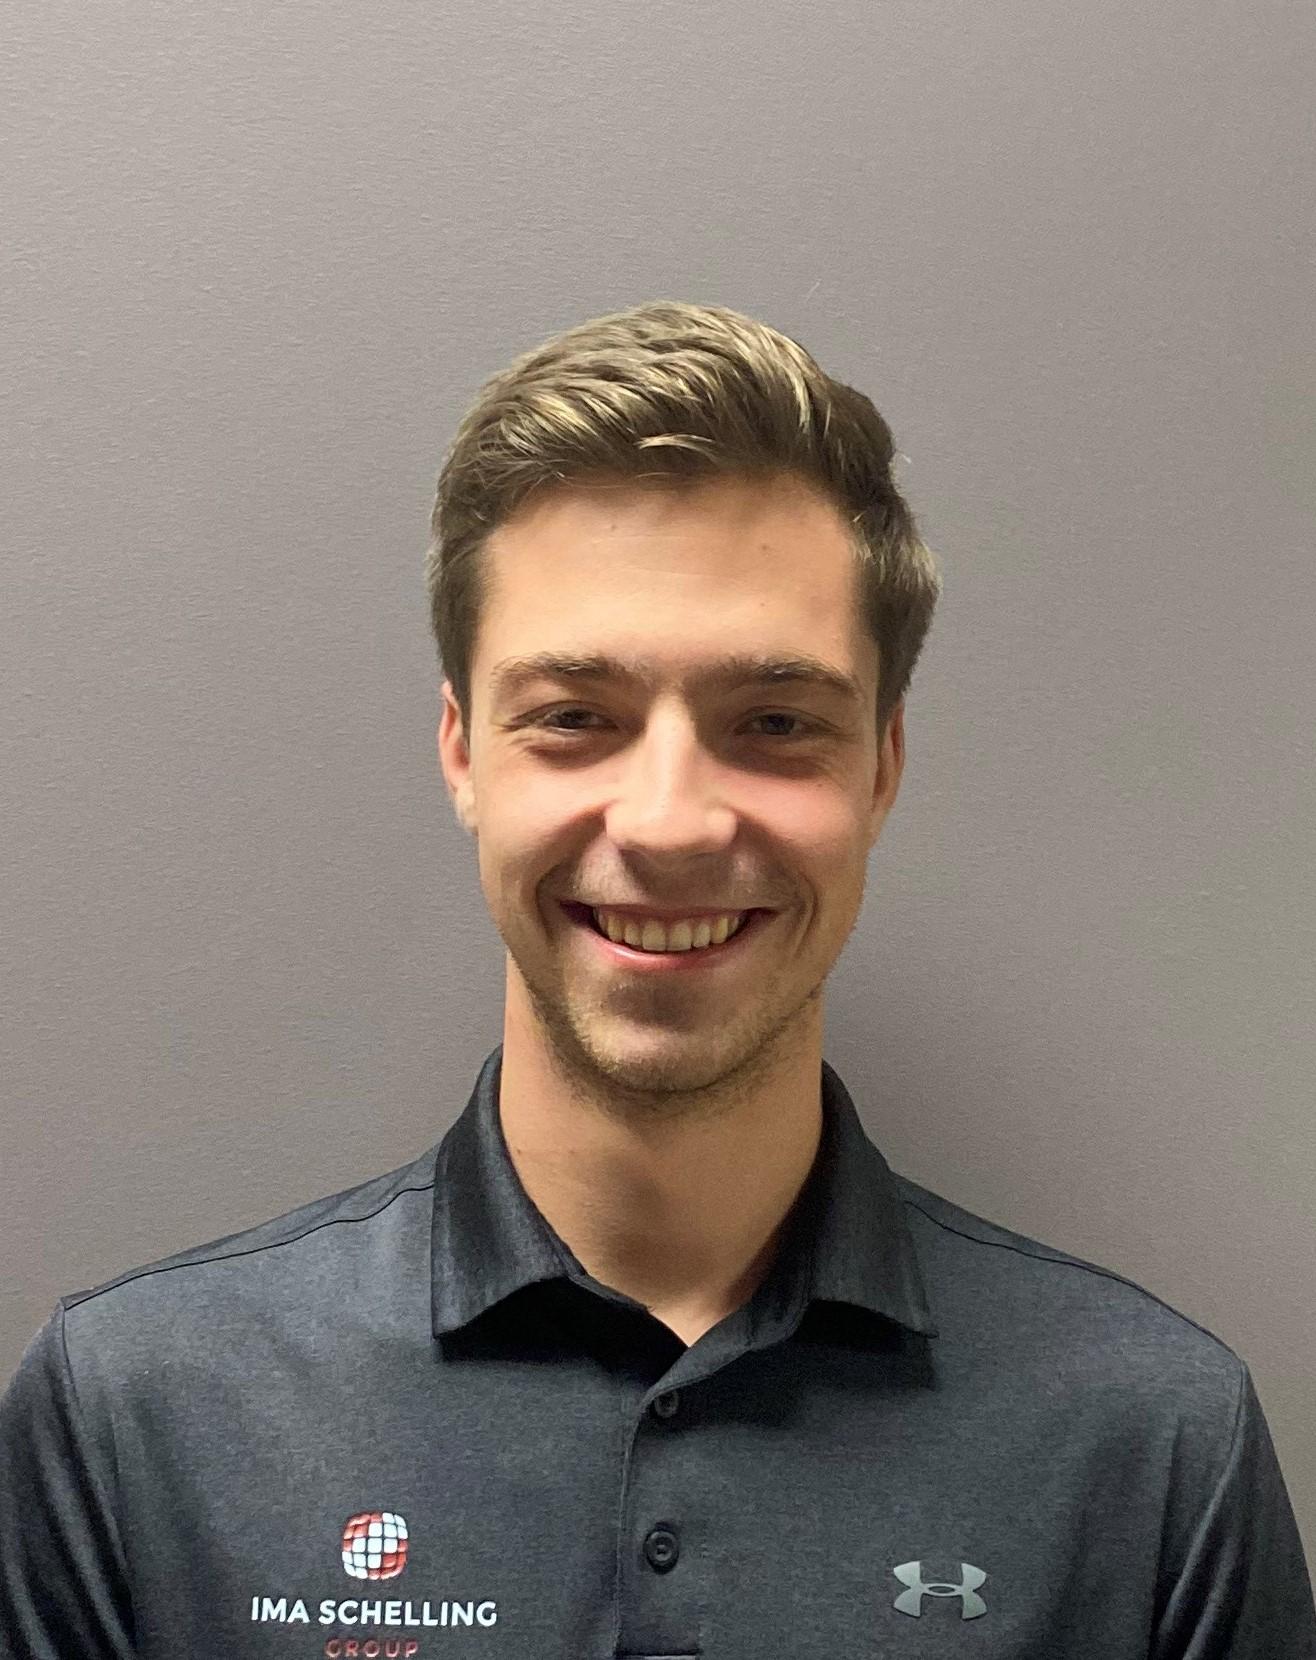 Florian Kleinschmidt - IMA Schelling USA - Southeast Territory Regional Sales Manager